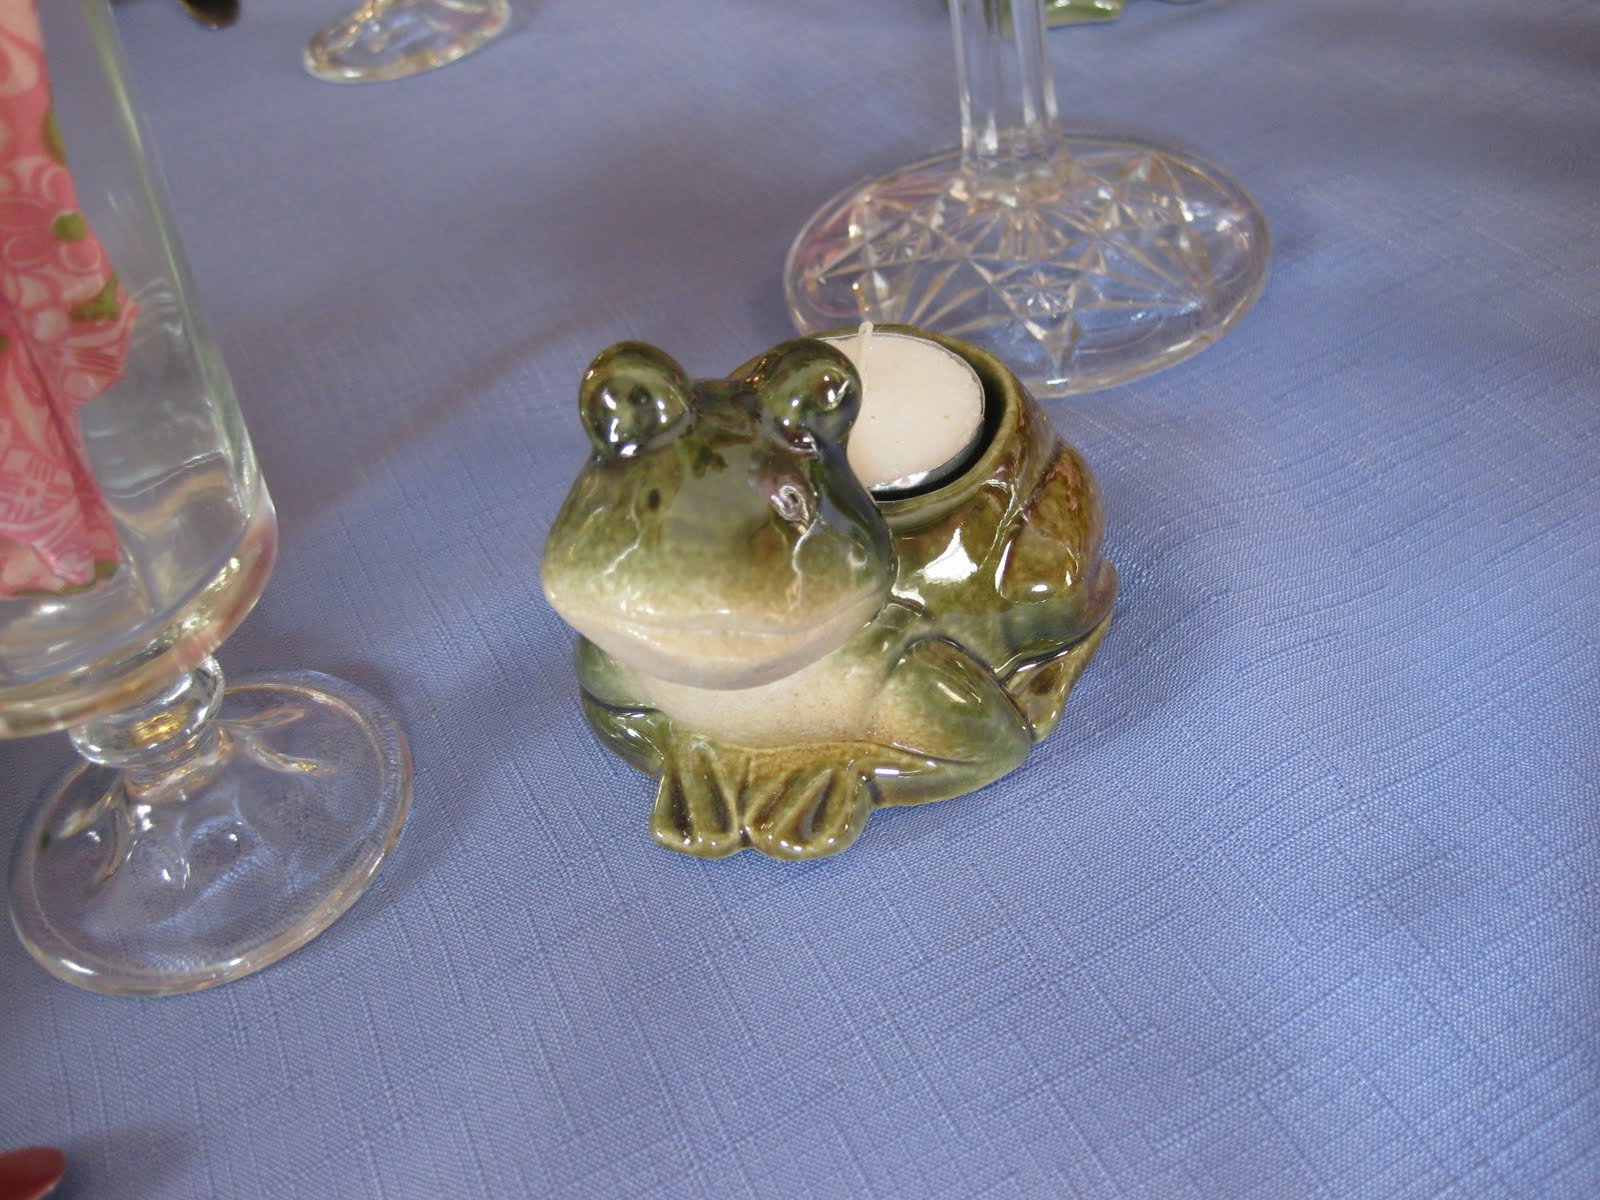 http://2.bp.blogspot.com/_56iOfaDEHks/TDKPDCghdaI/AAAAAAAAE-I/RS6tlYo_Hvs/s1600/TT+-+Frogs+006.JPG